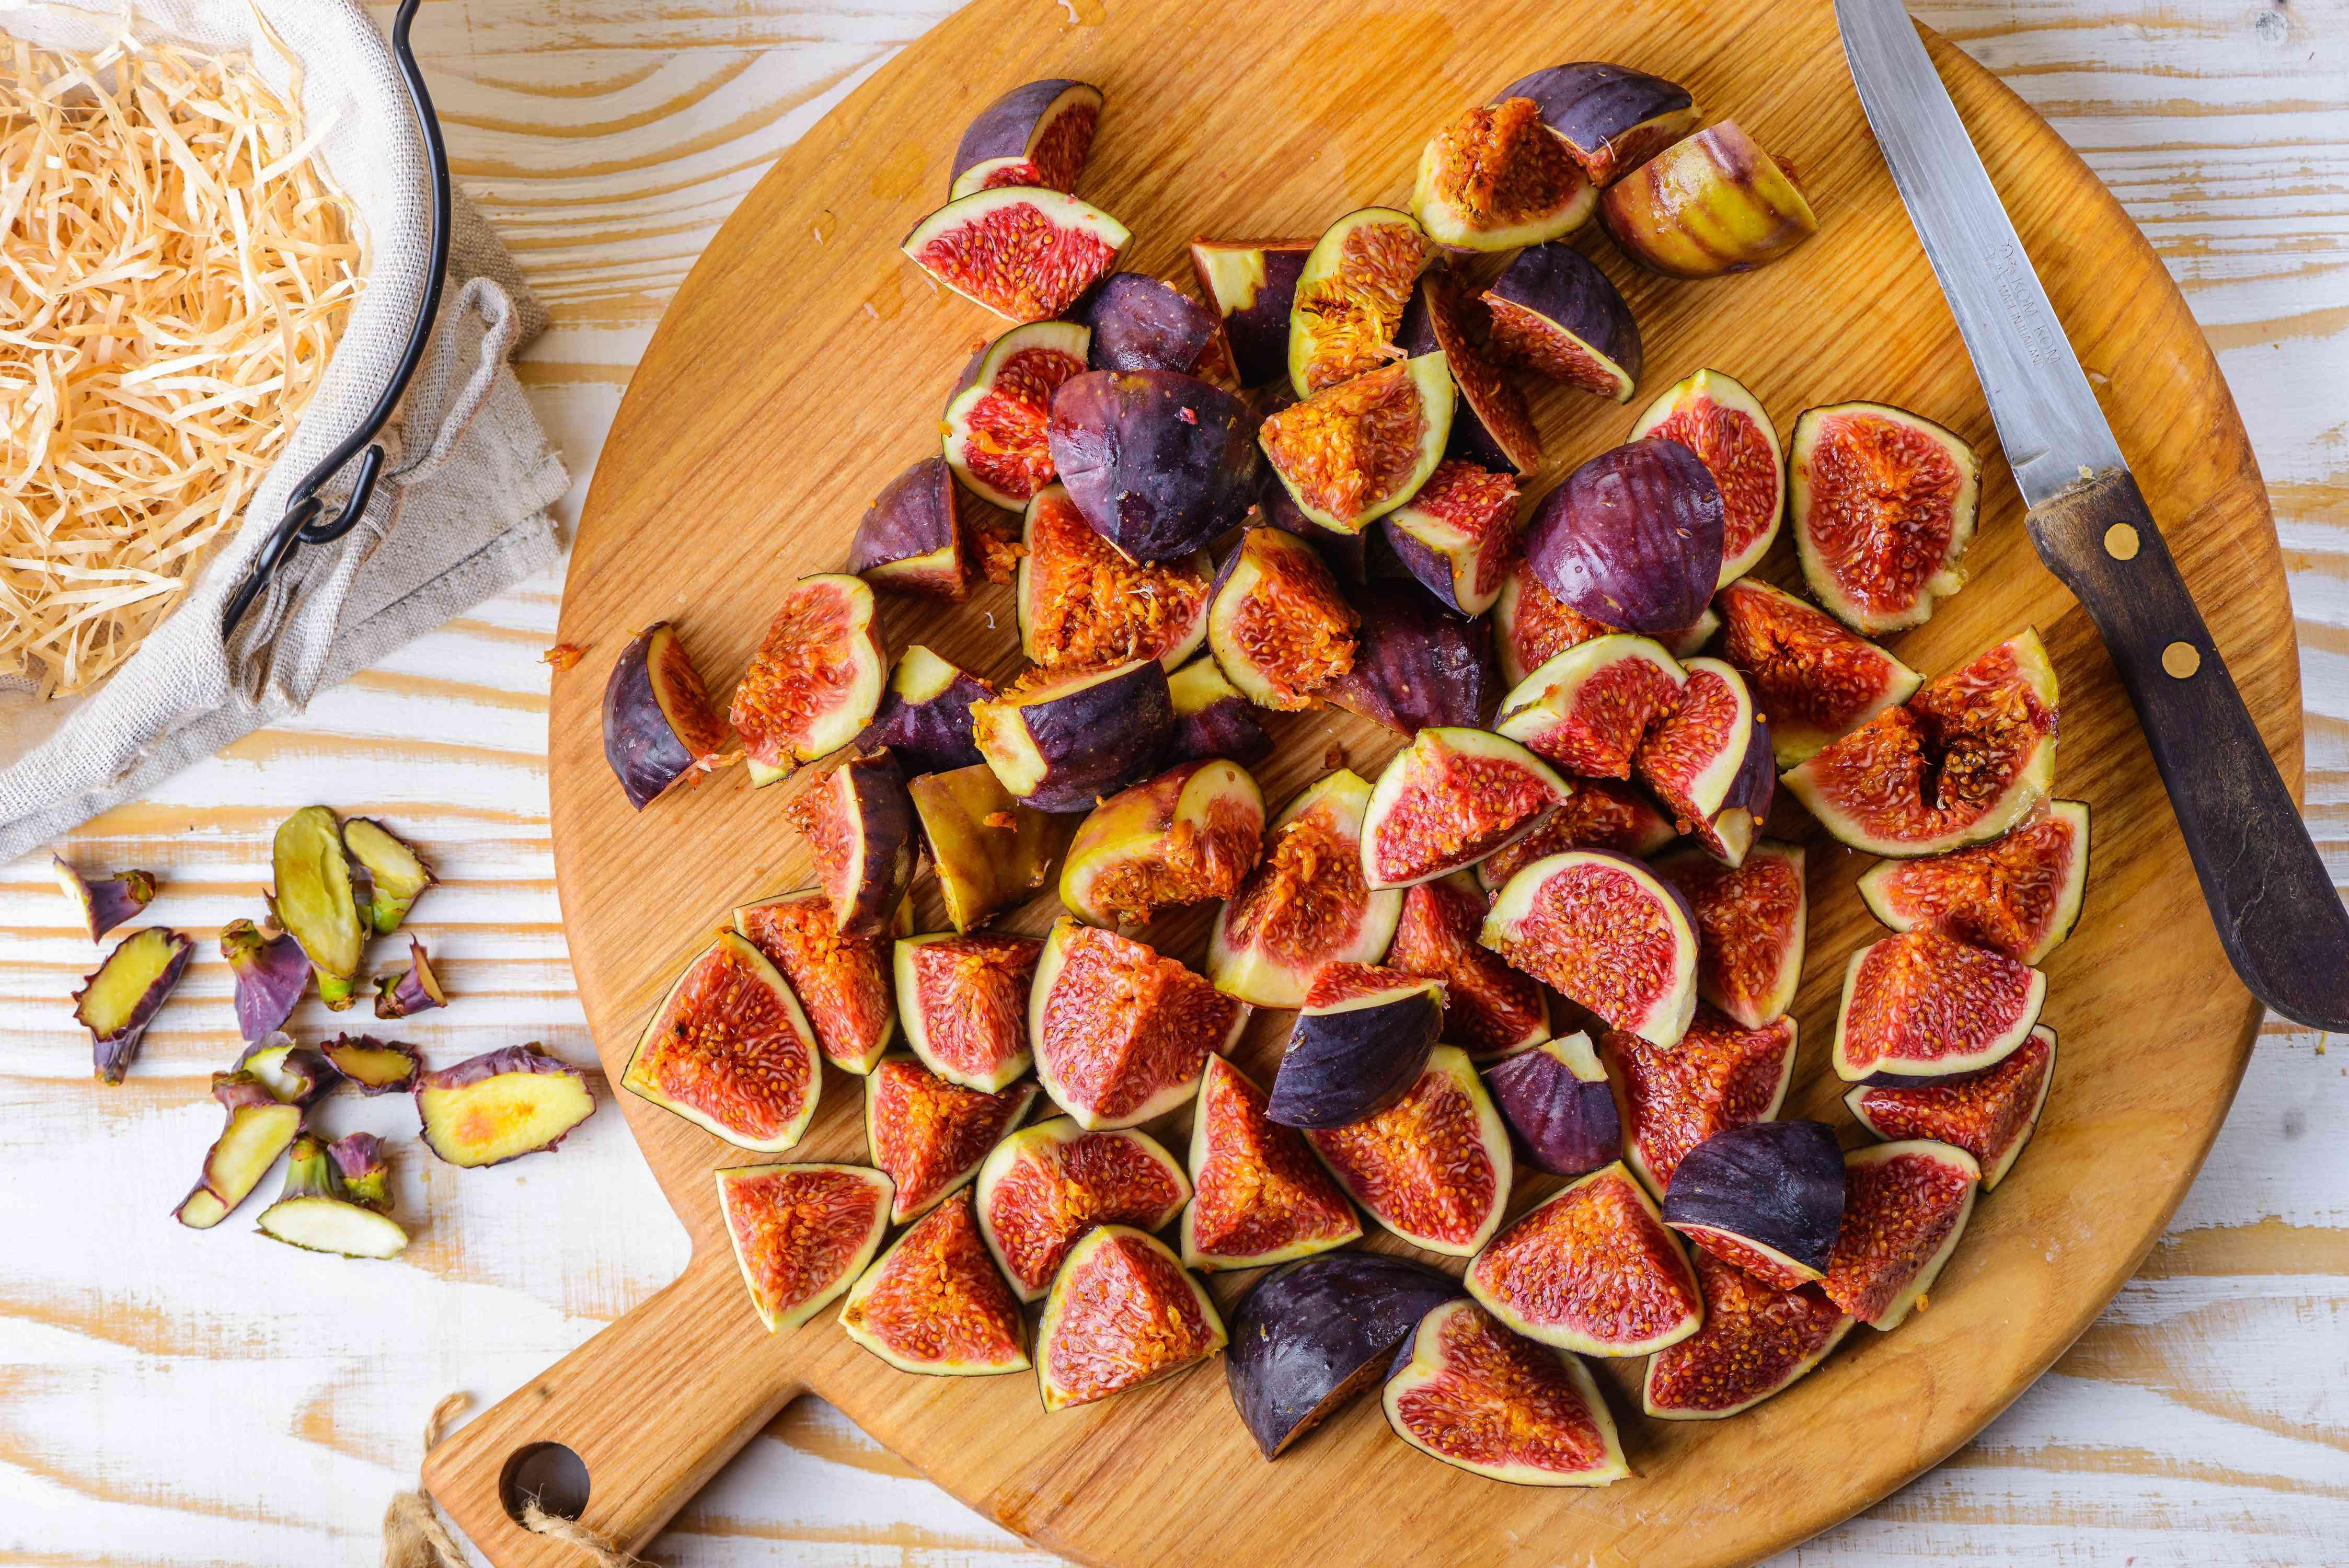 Chop figs